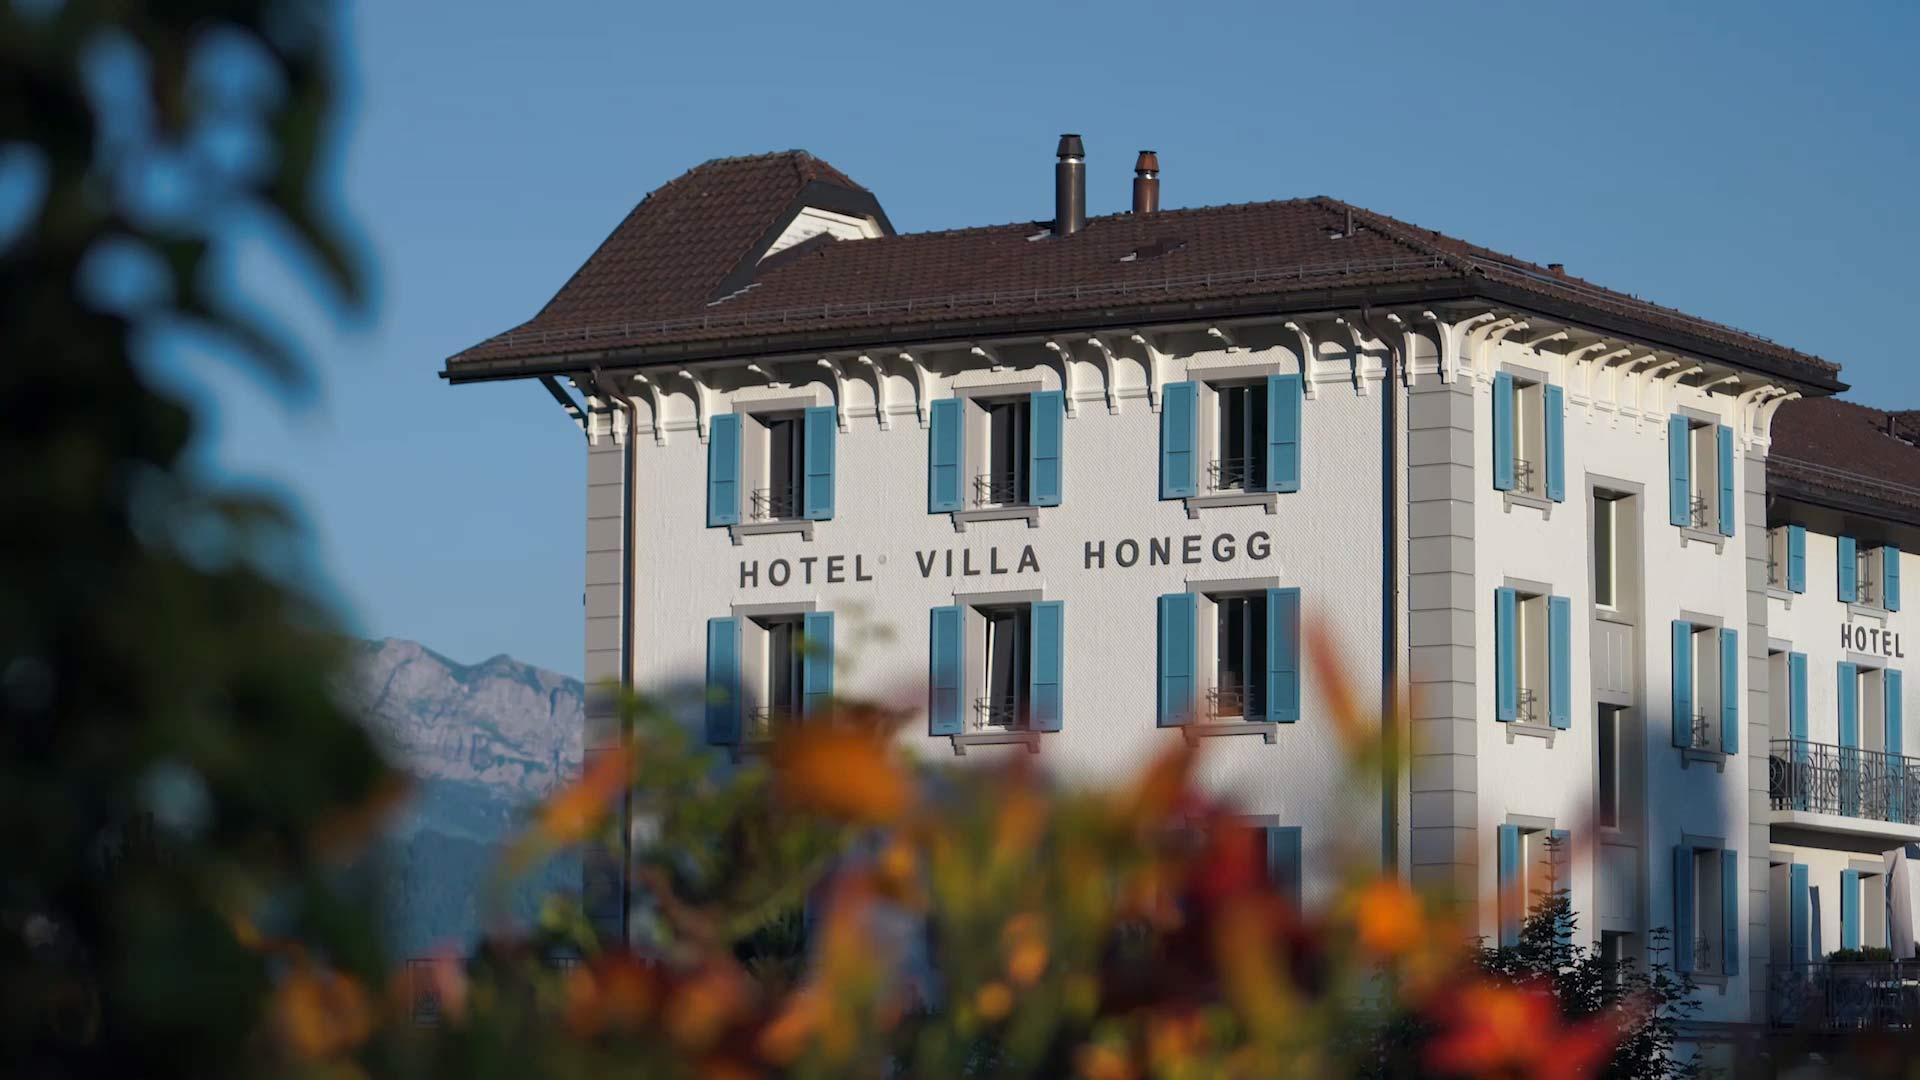 Hotel Villa Honegg intérieur the boutique hotel in the heart of switzerland | hotel villa honegg